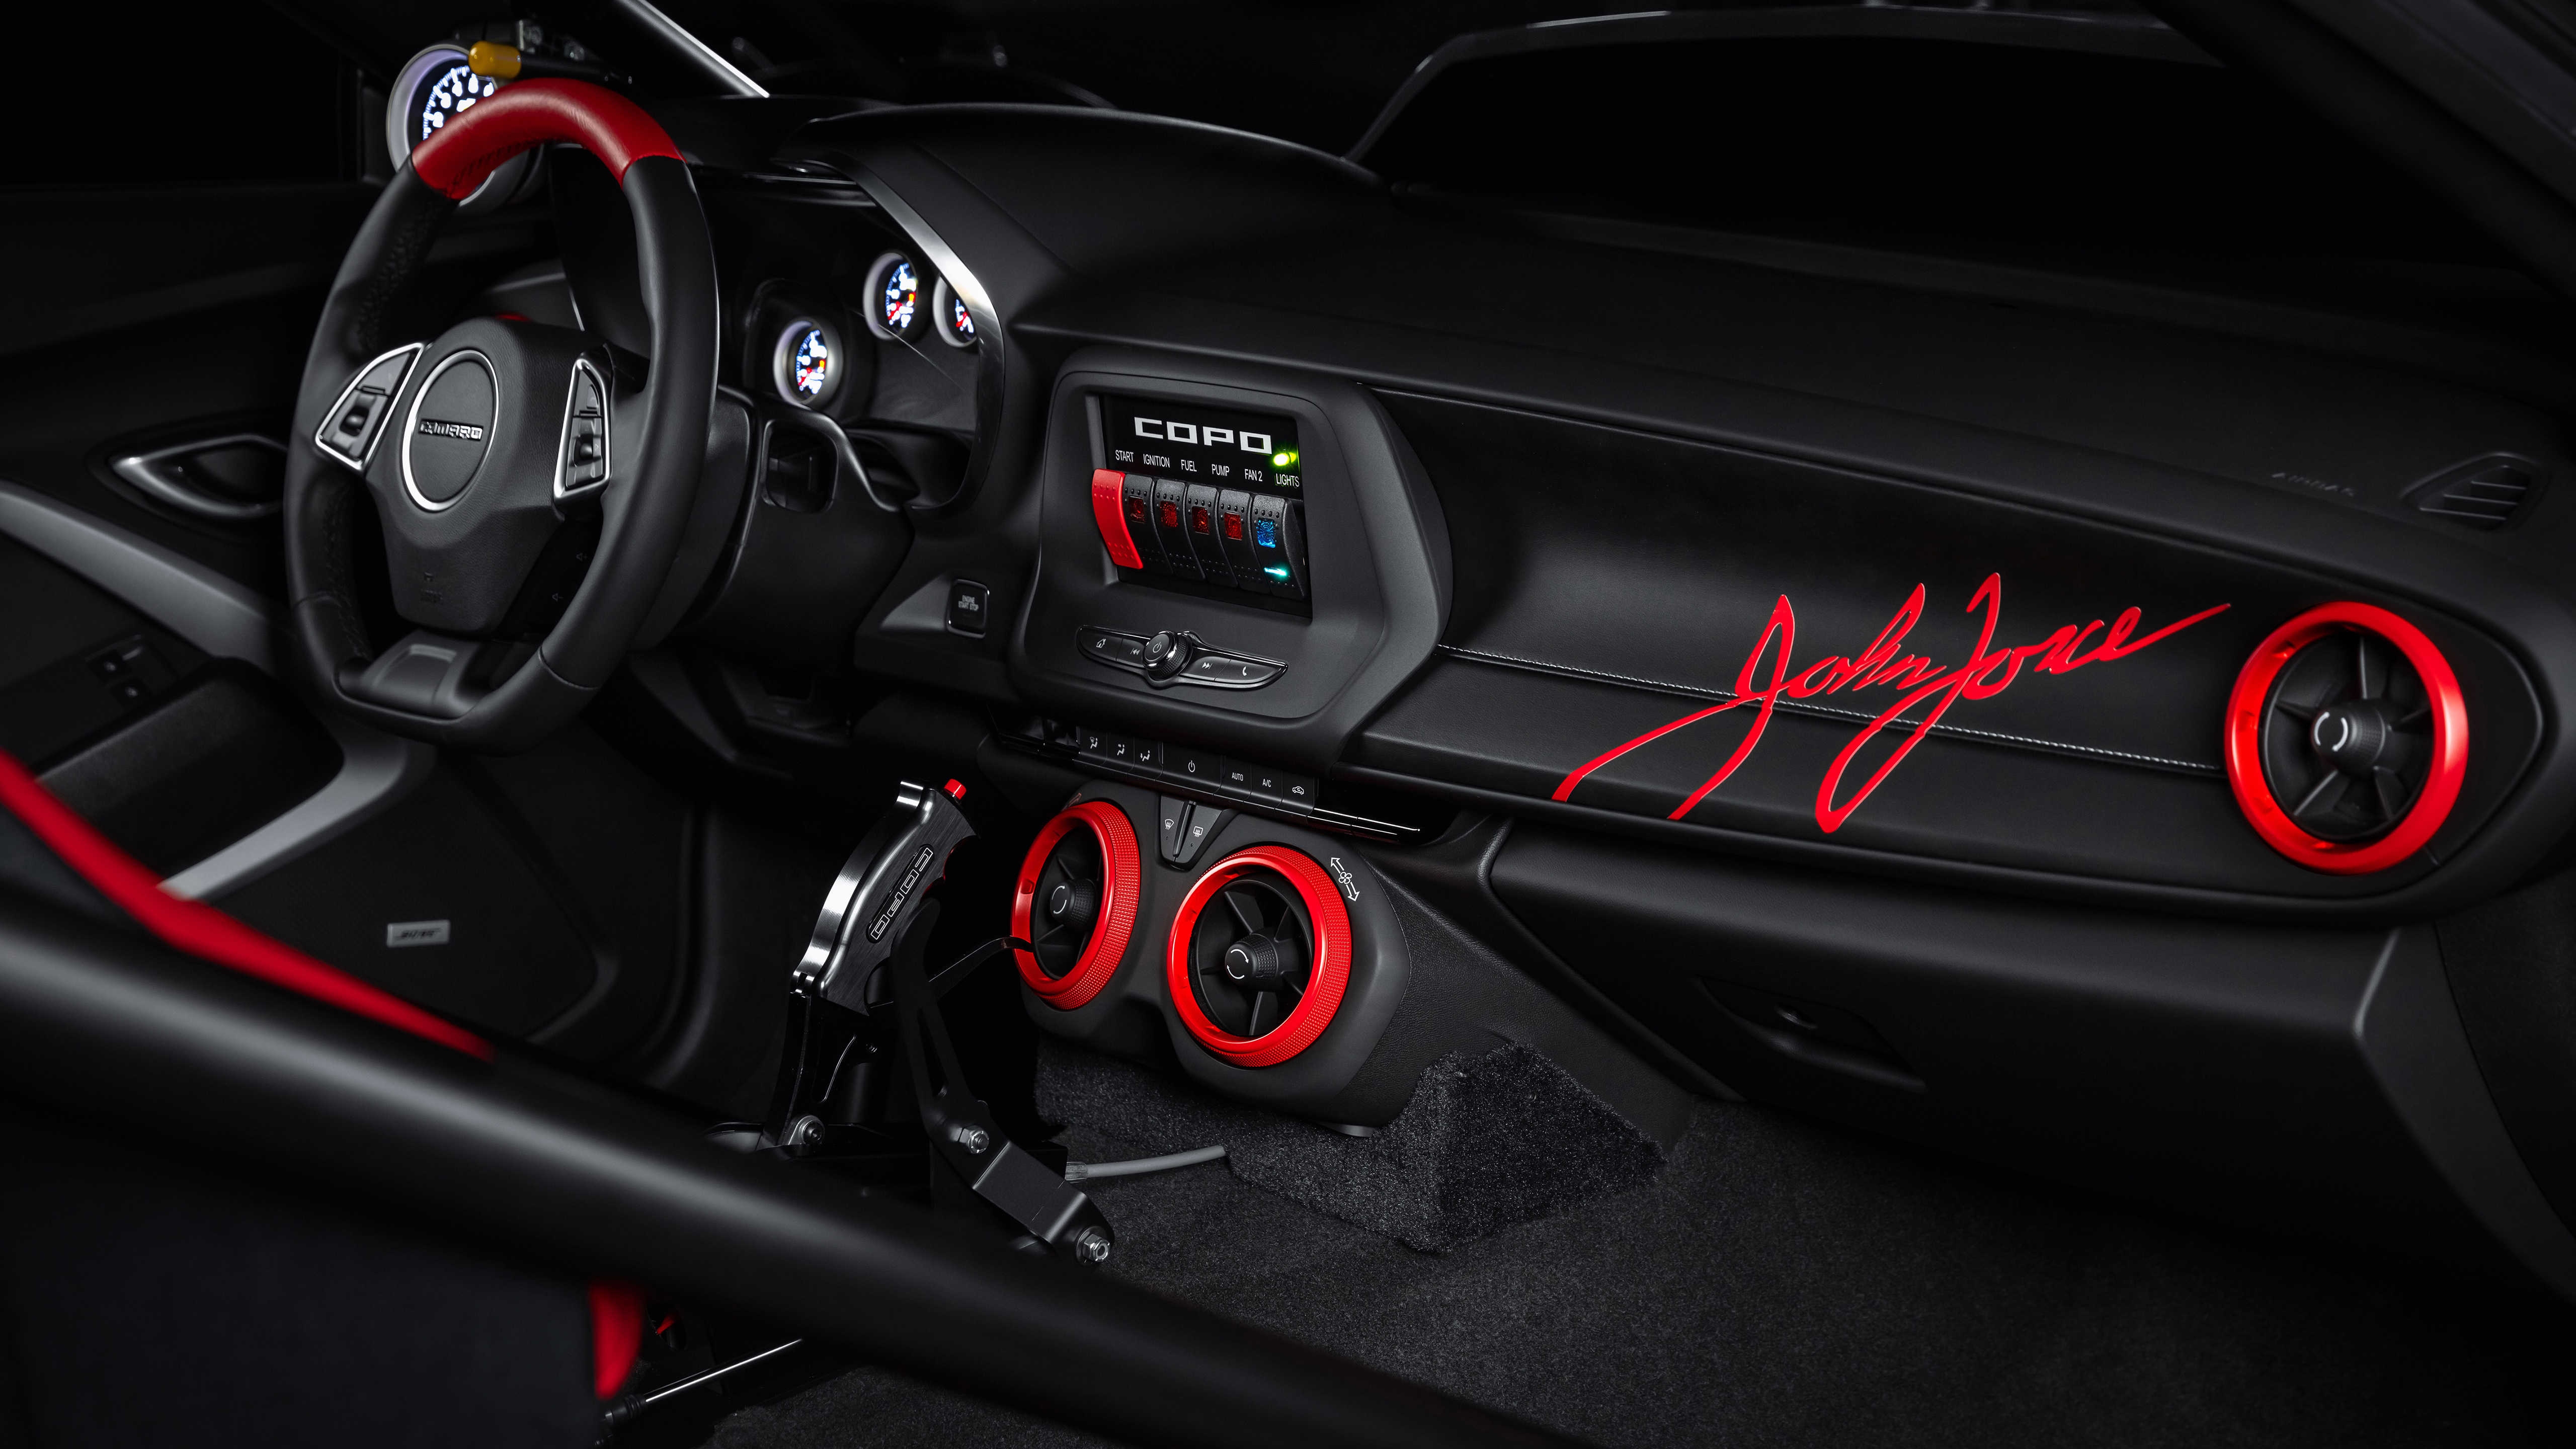 2020 Chevrolet COPO Camaro John Force Edition 4K Interior 5120x2880